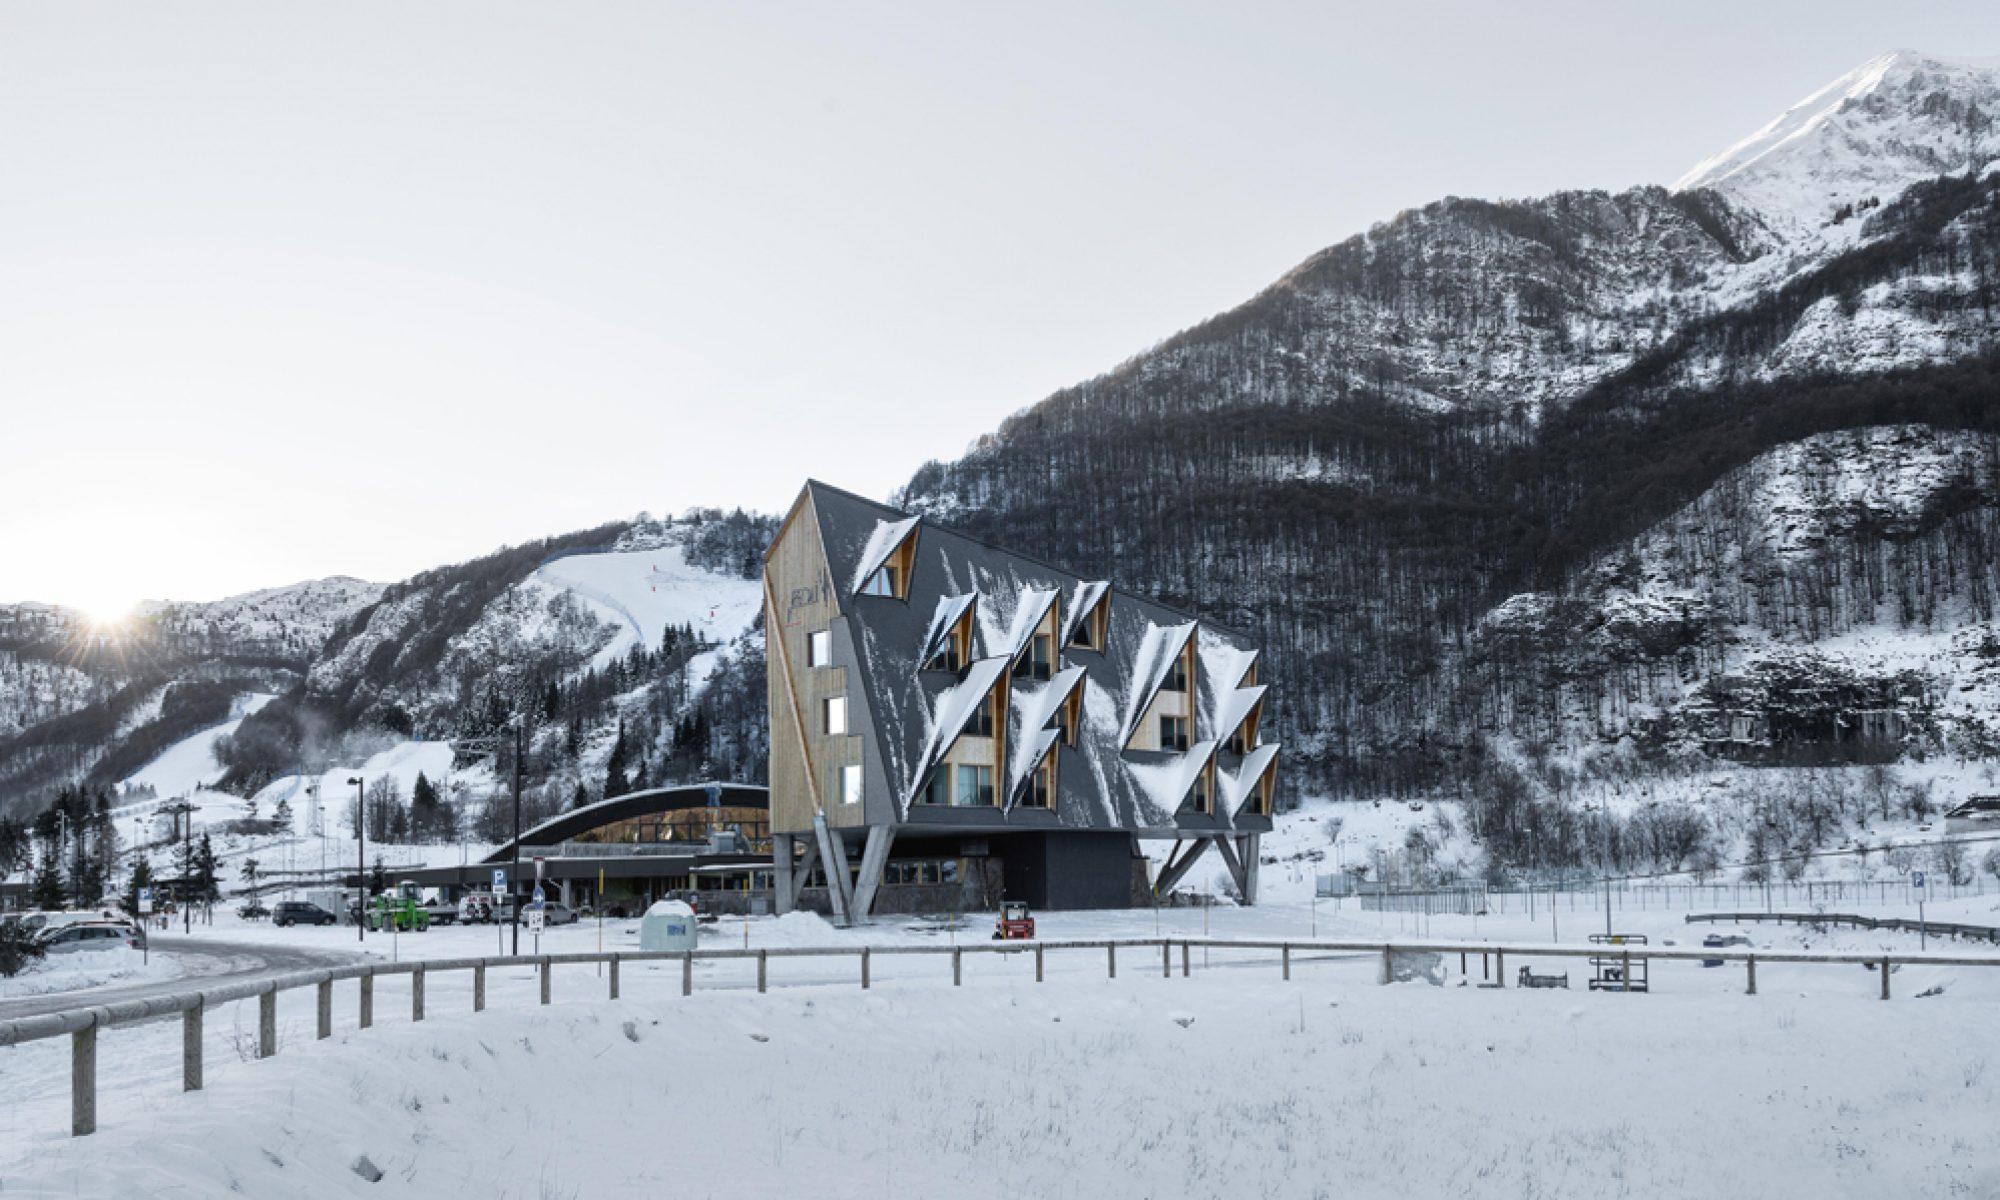 HOTEL 1301iNN – SLOWHORSE